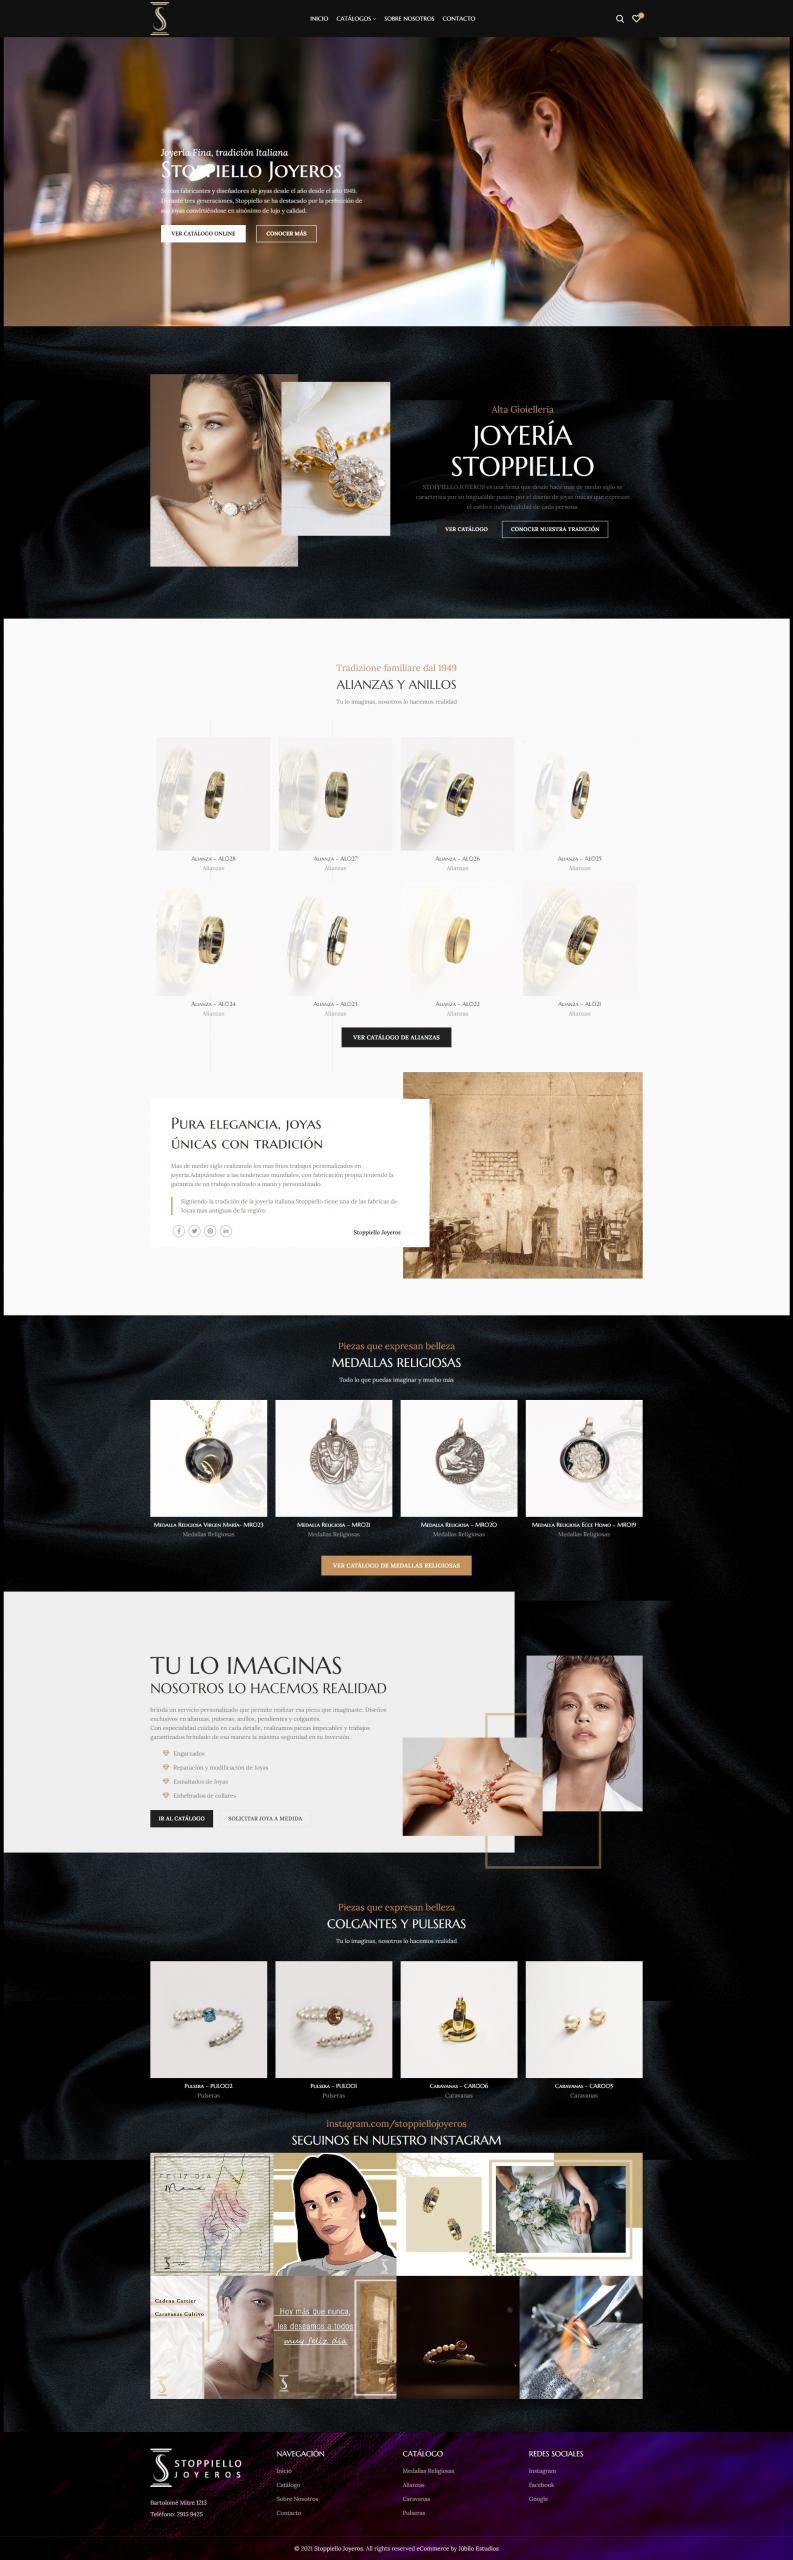 Diseño Web, eCommerce